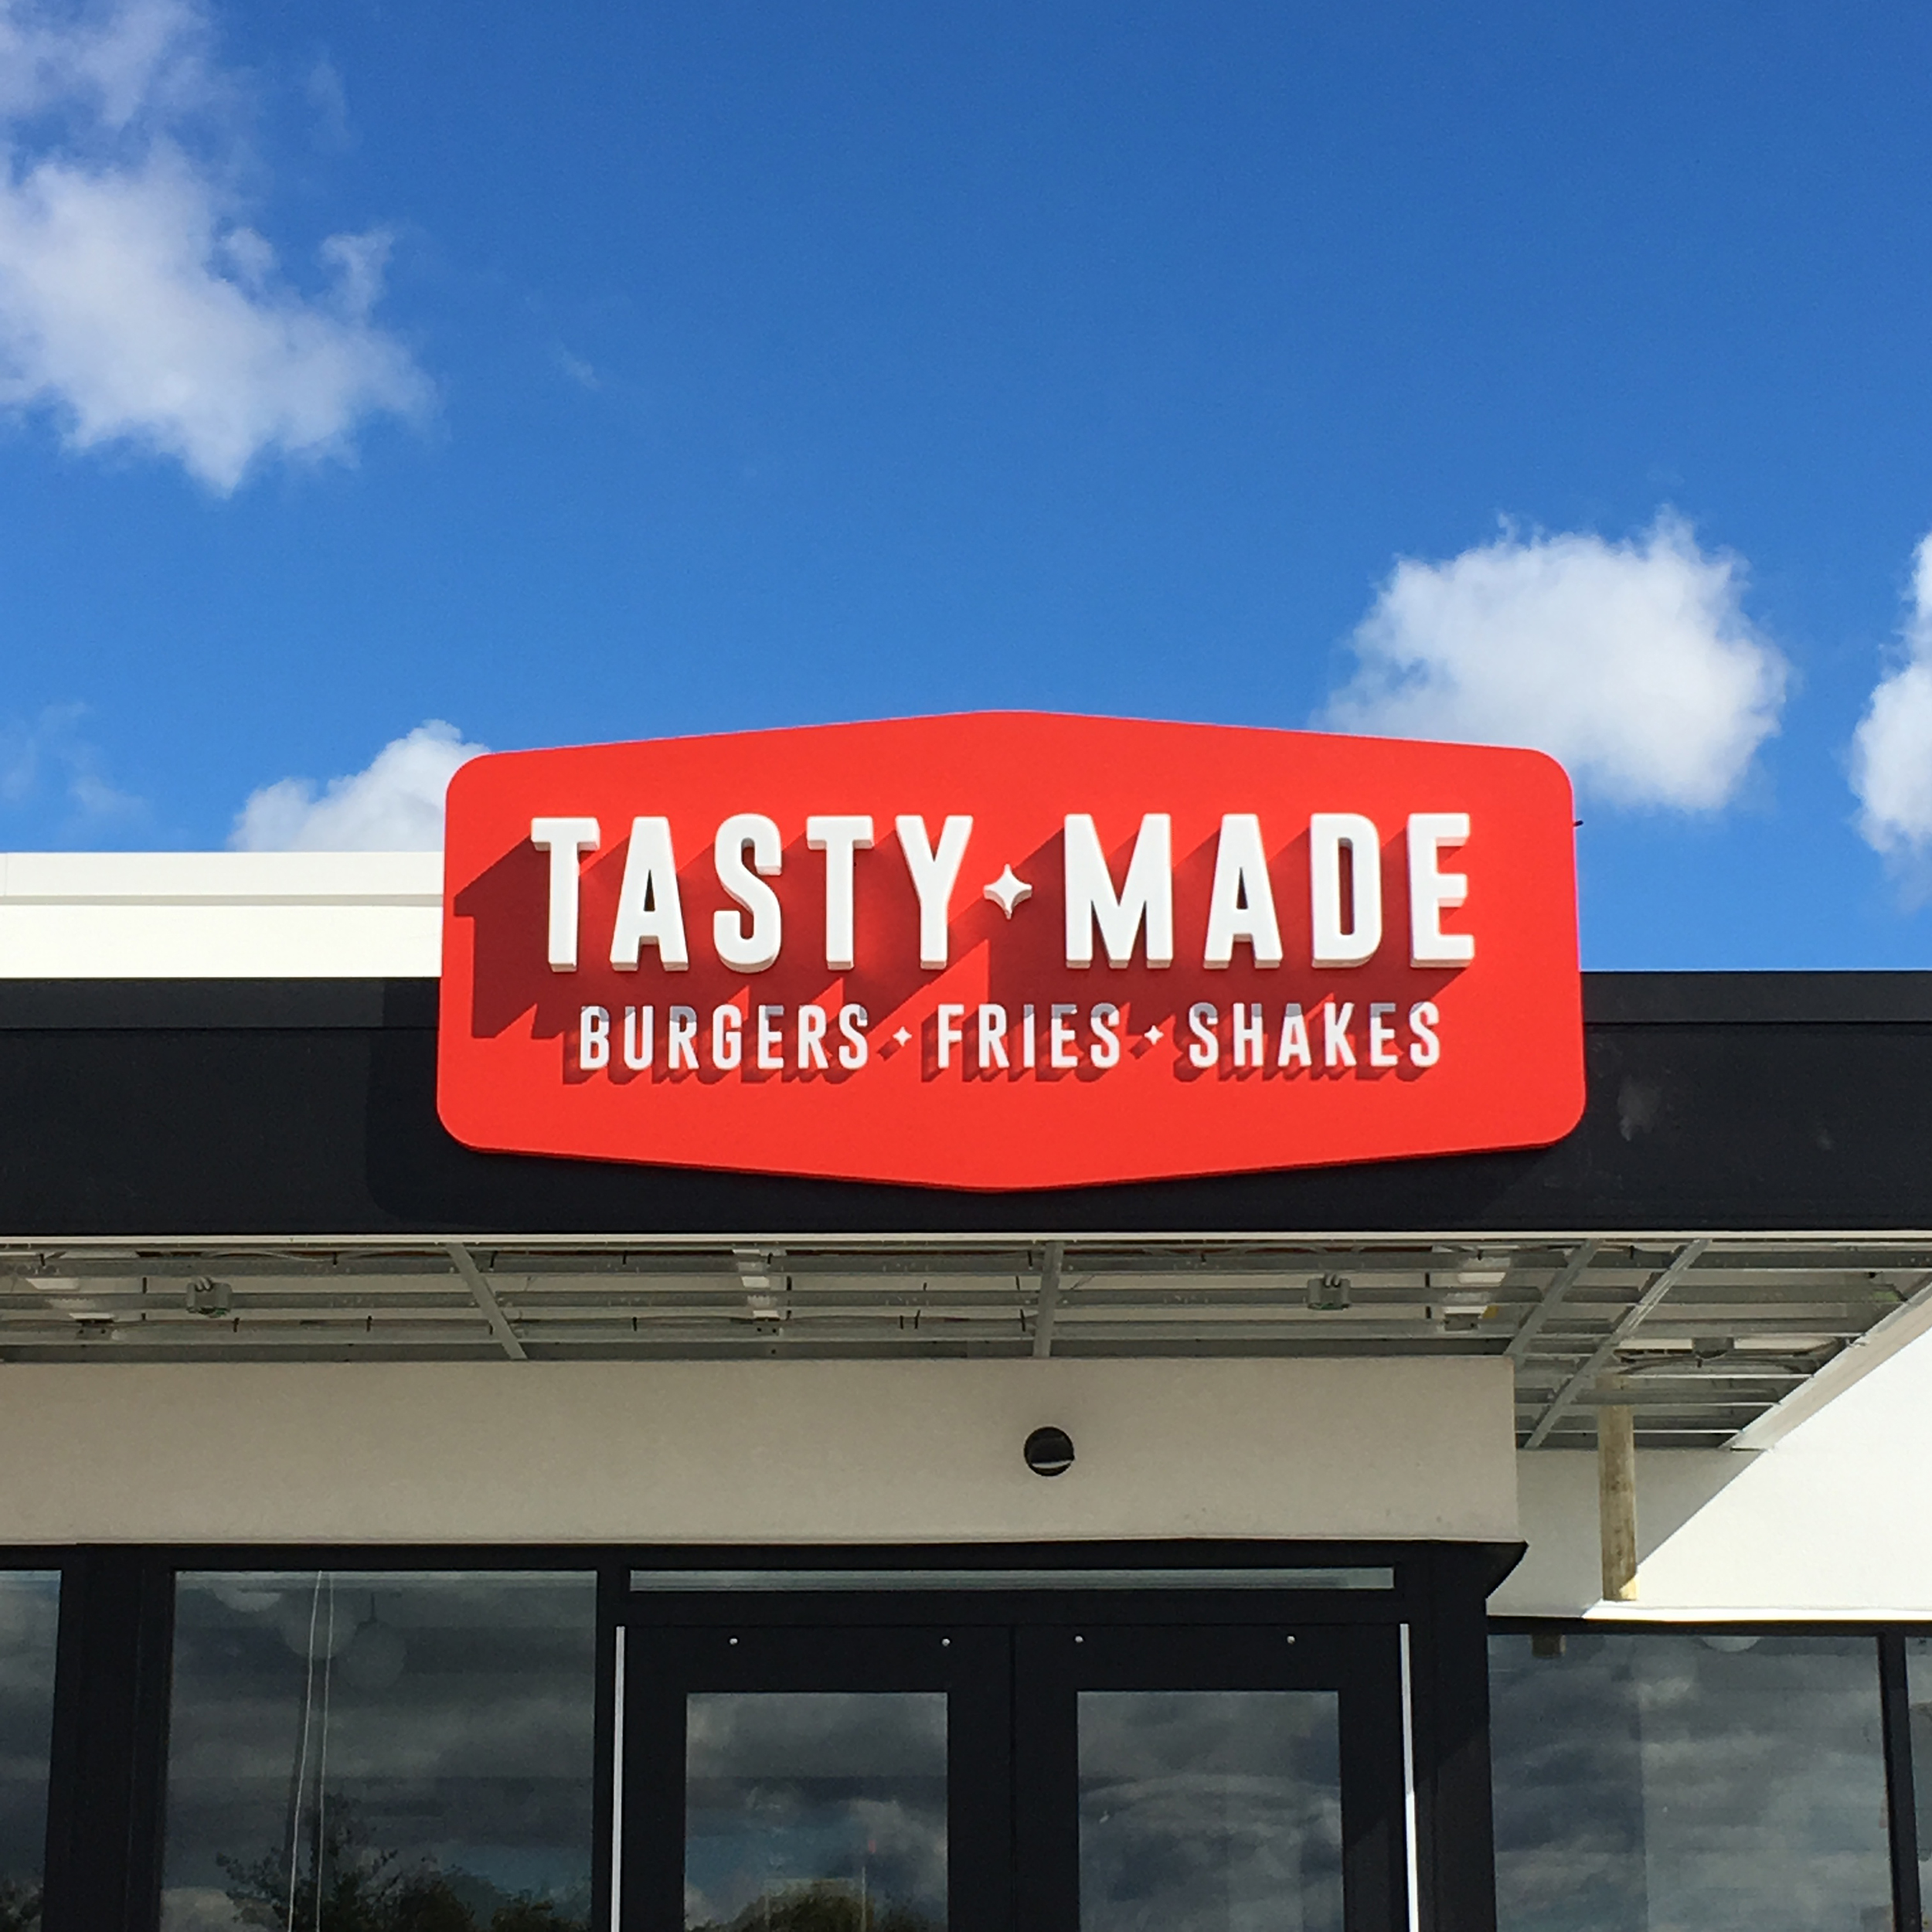 TastyMade_awning sign.JPG